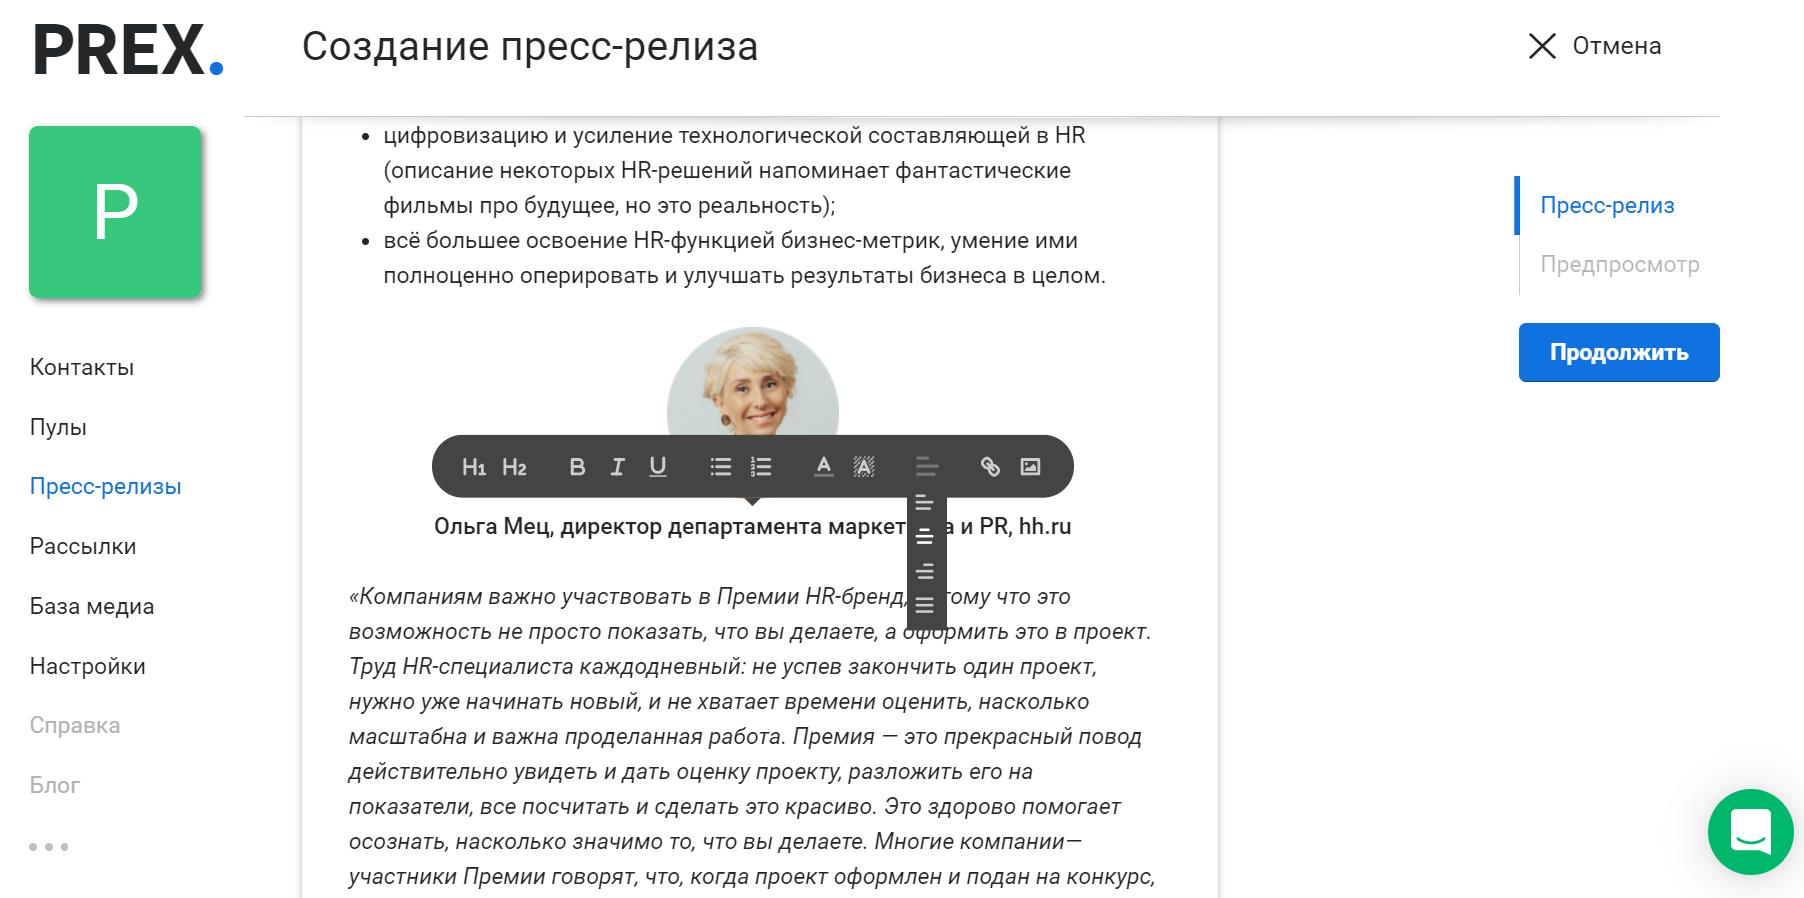 пресс-релиз PREX